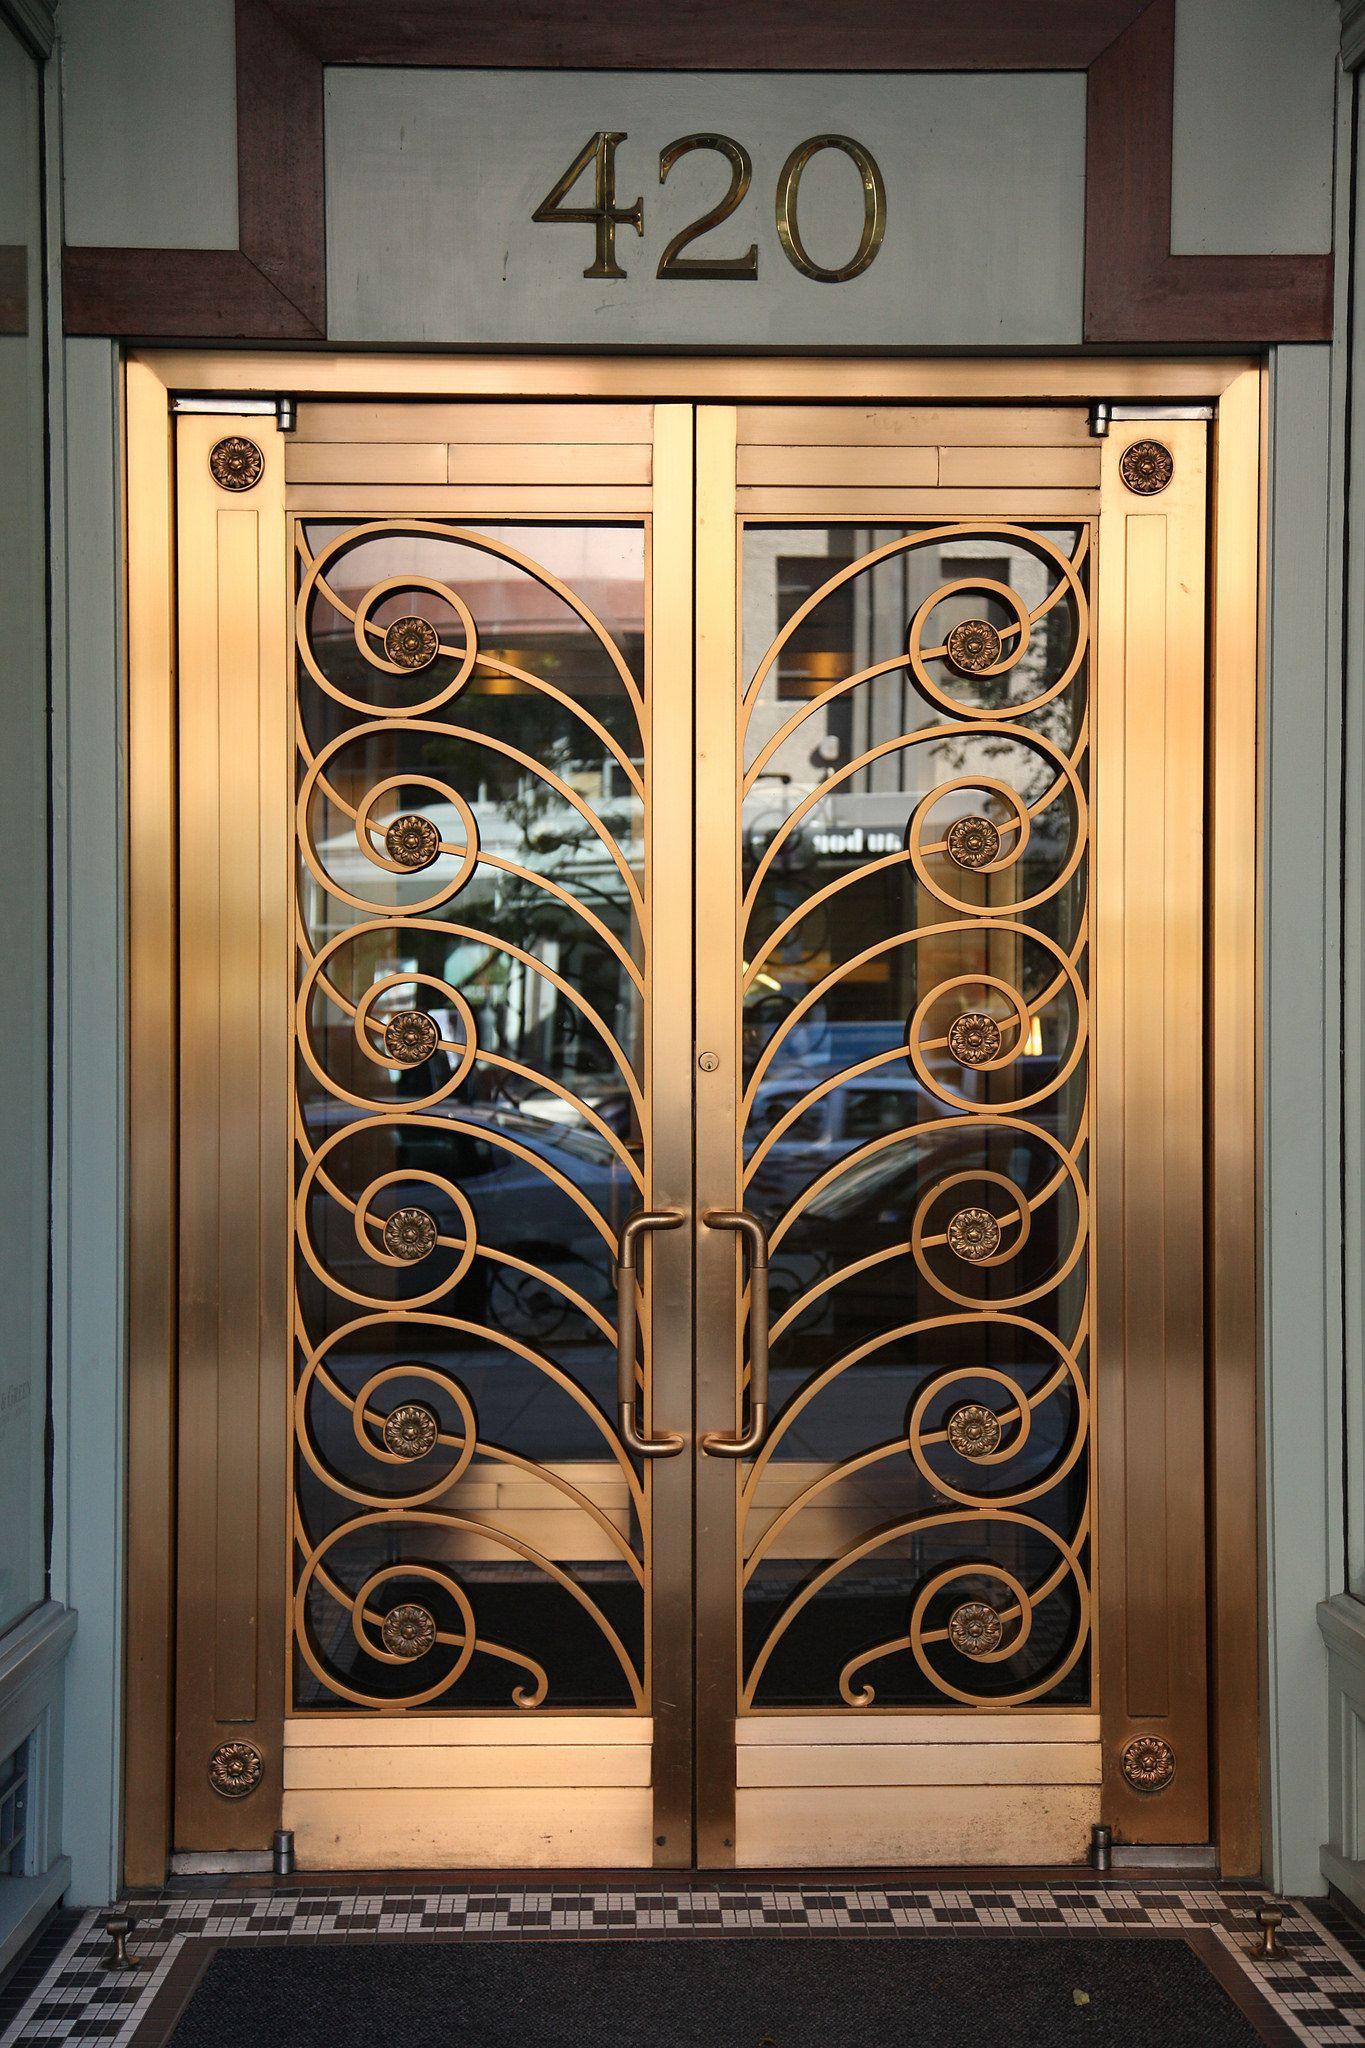 boylston art pinterest art deco doors and building